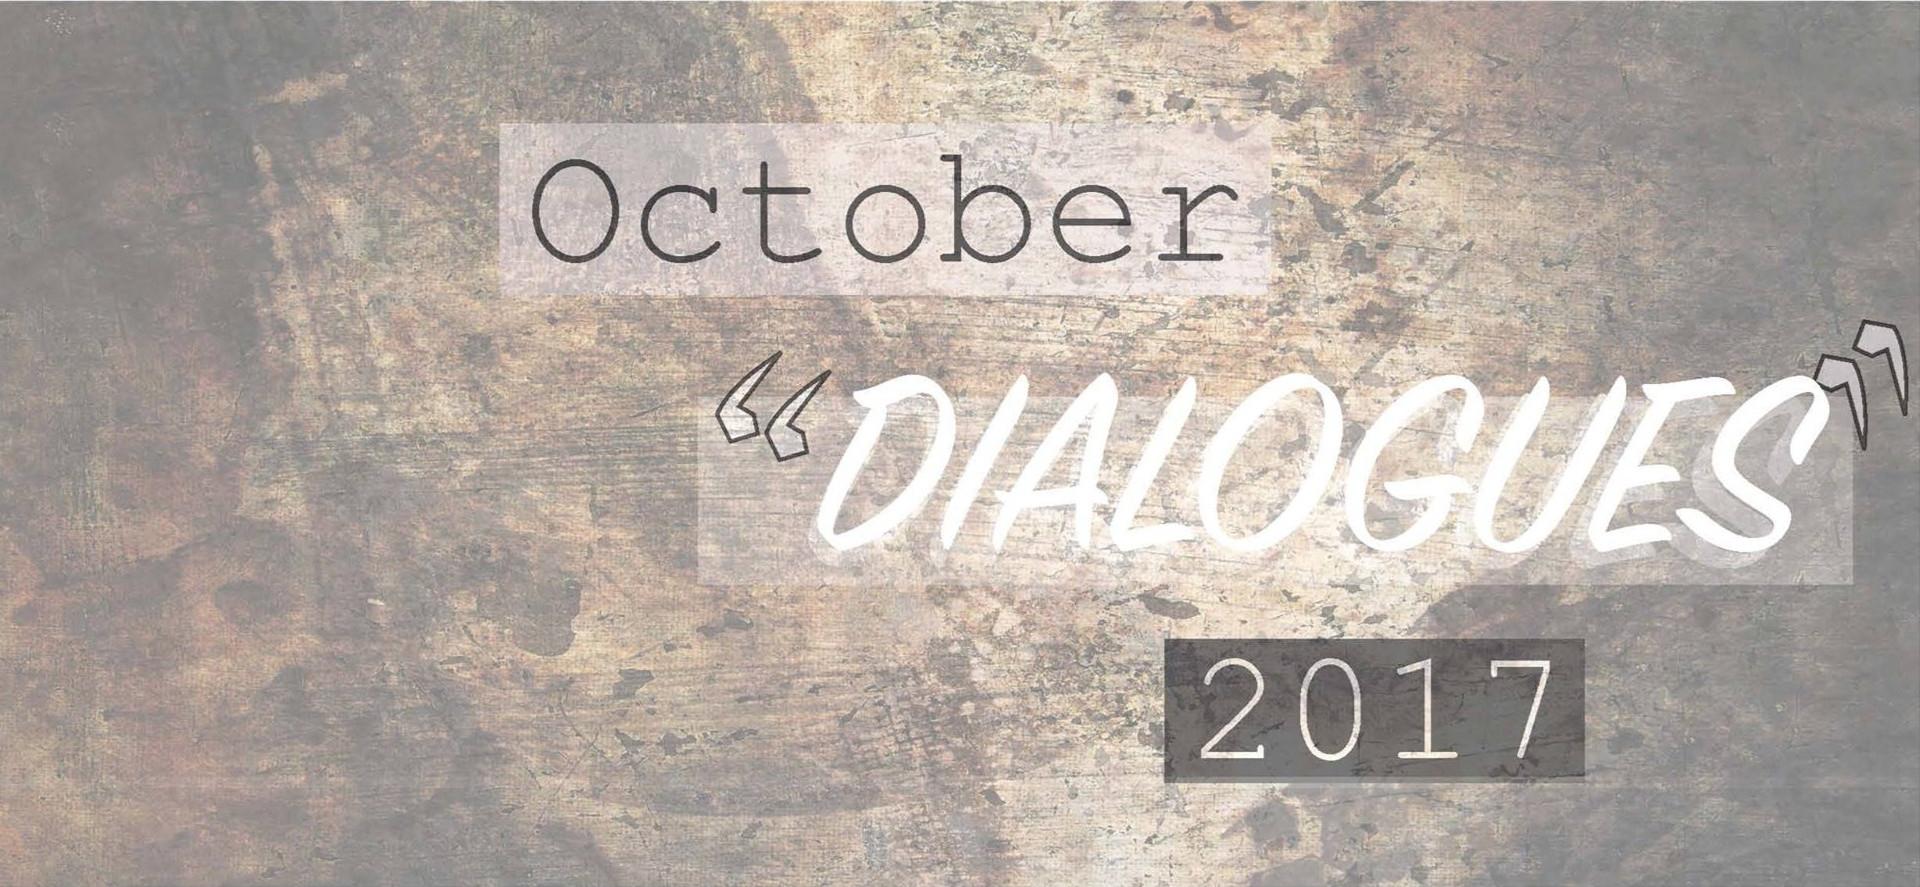 October%20Dialogues%20logo_edited.jpg